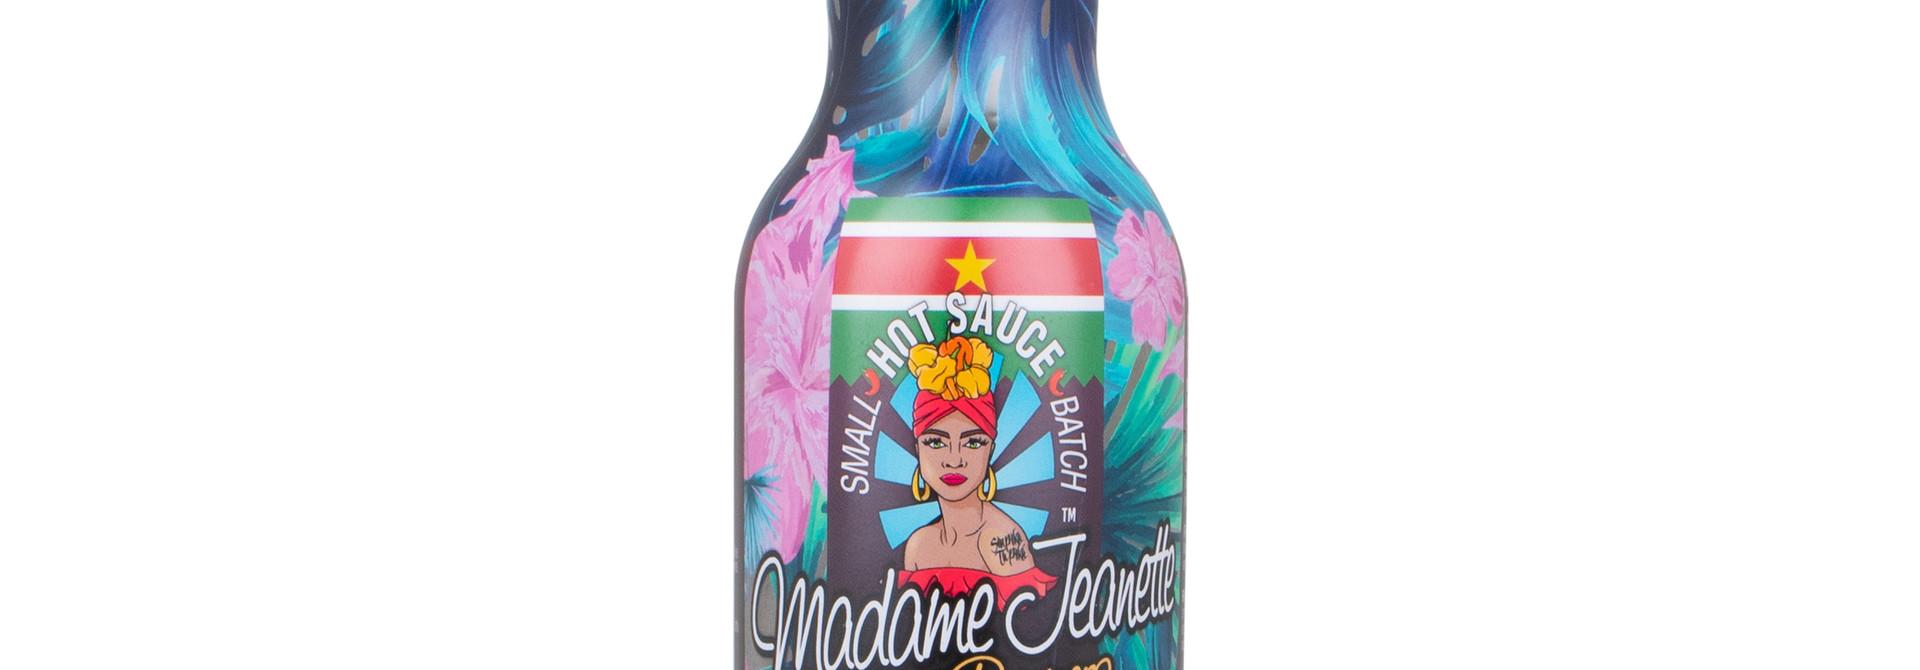 Madame Jeanette Hot Sauce™️- Surinam Soul 200ml Glass Bottle